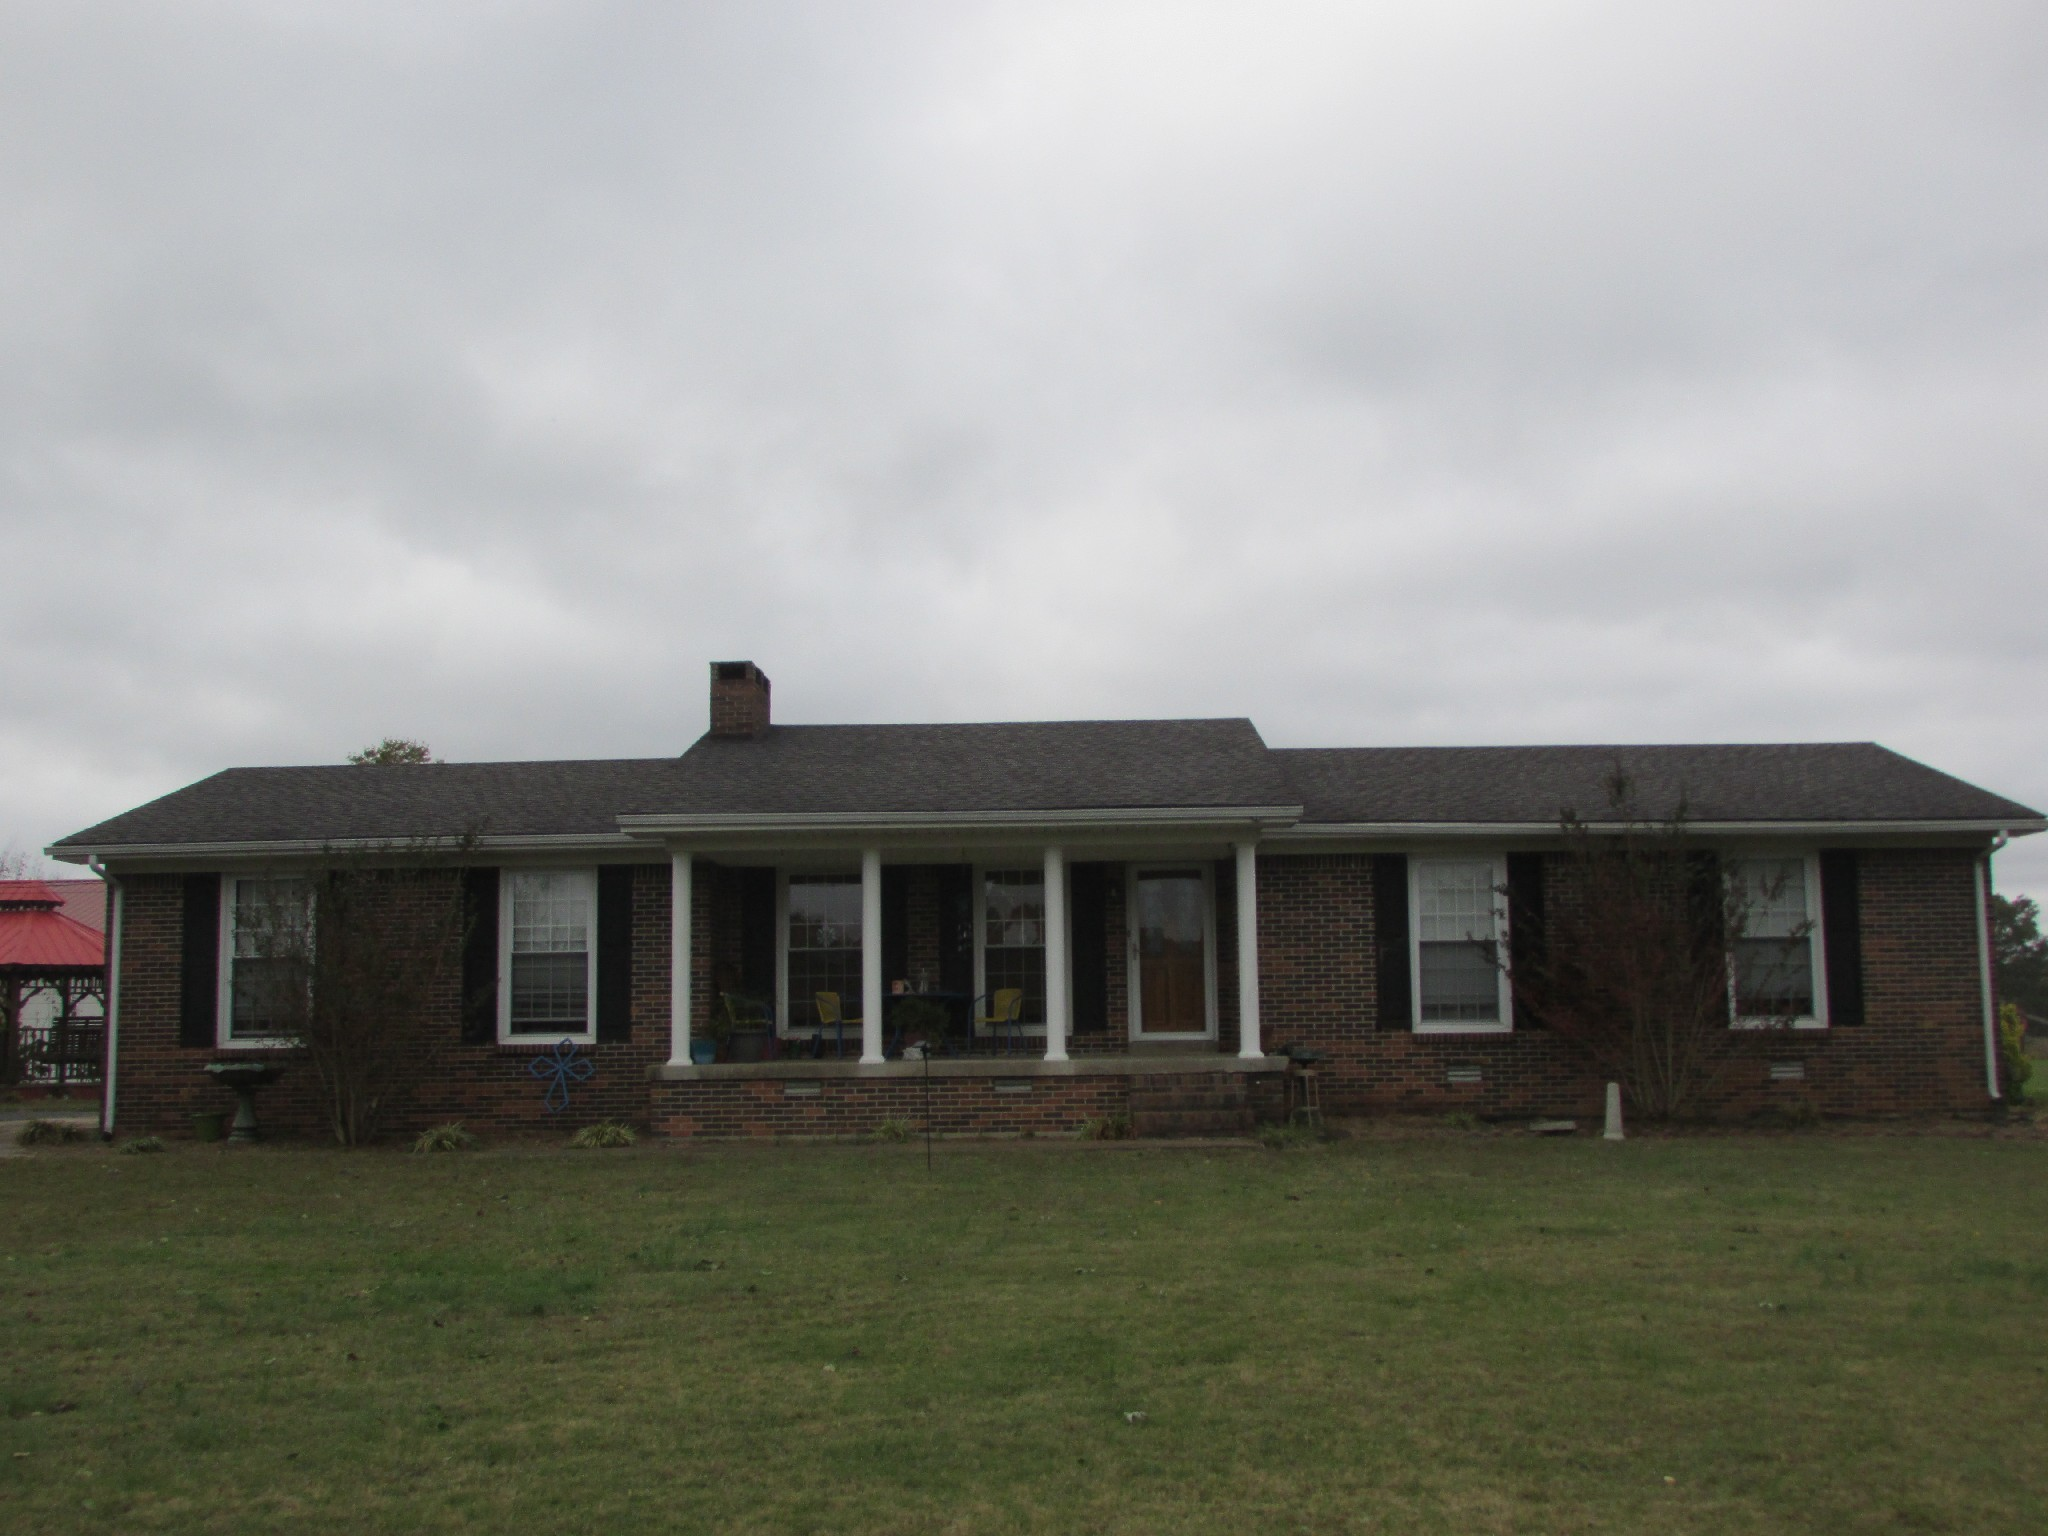 149 Hollaway St, N, Summertown, TN 38483 - Summertown, TN real estate listing